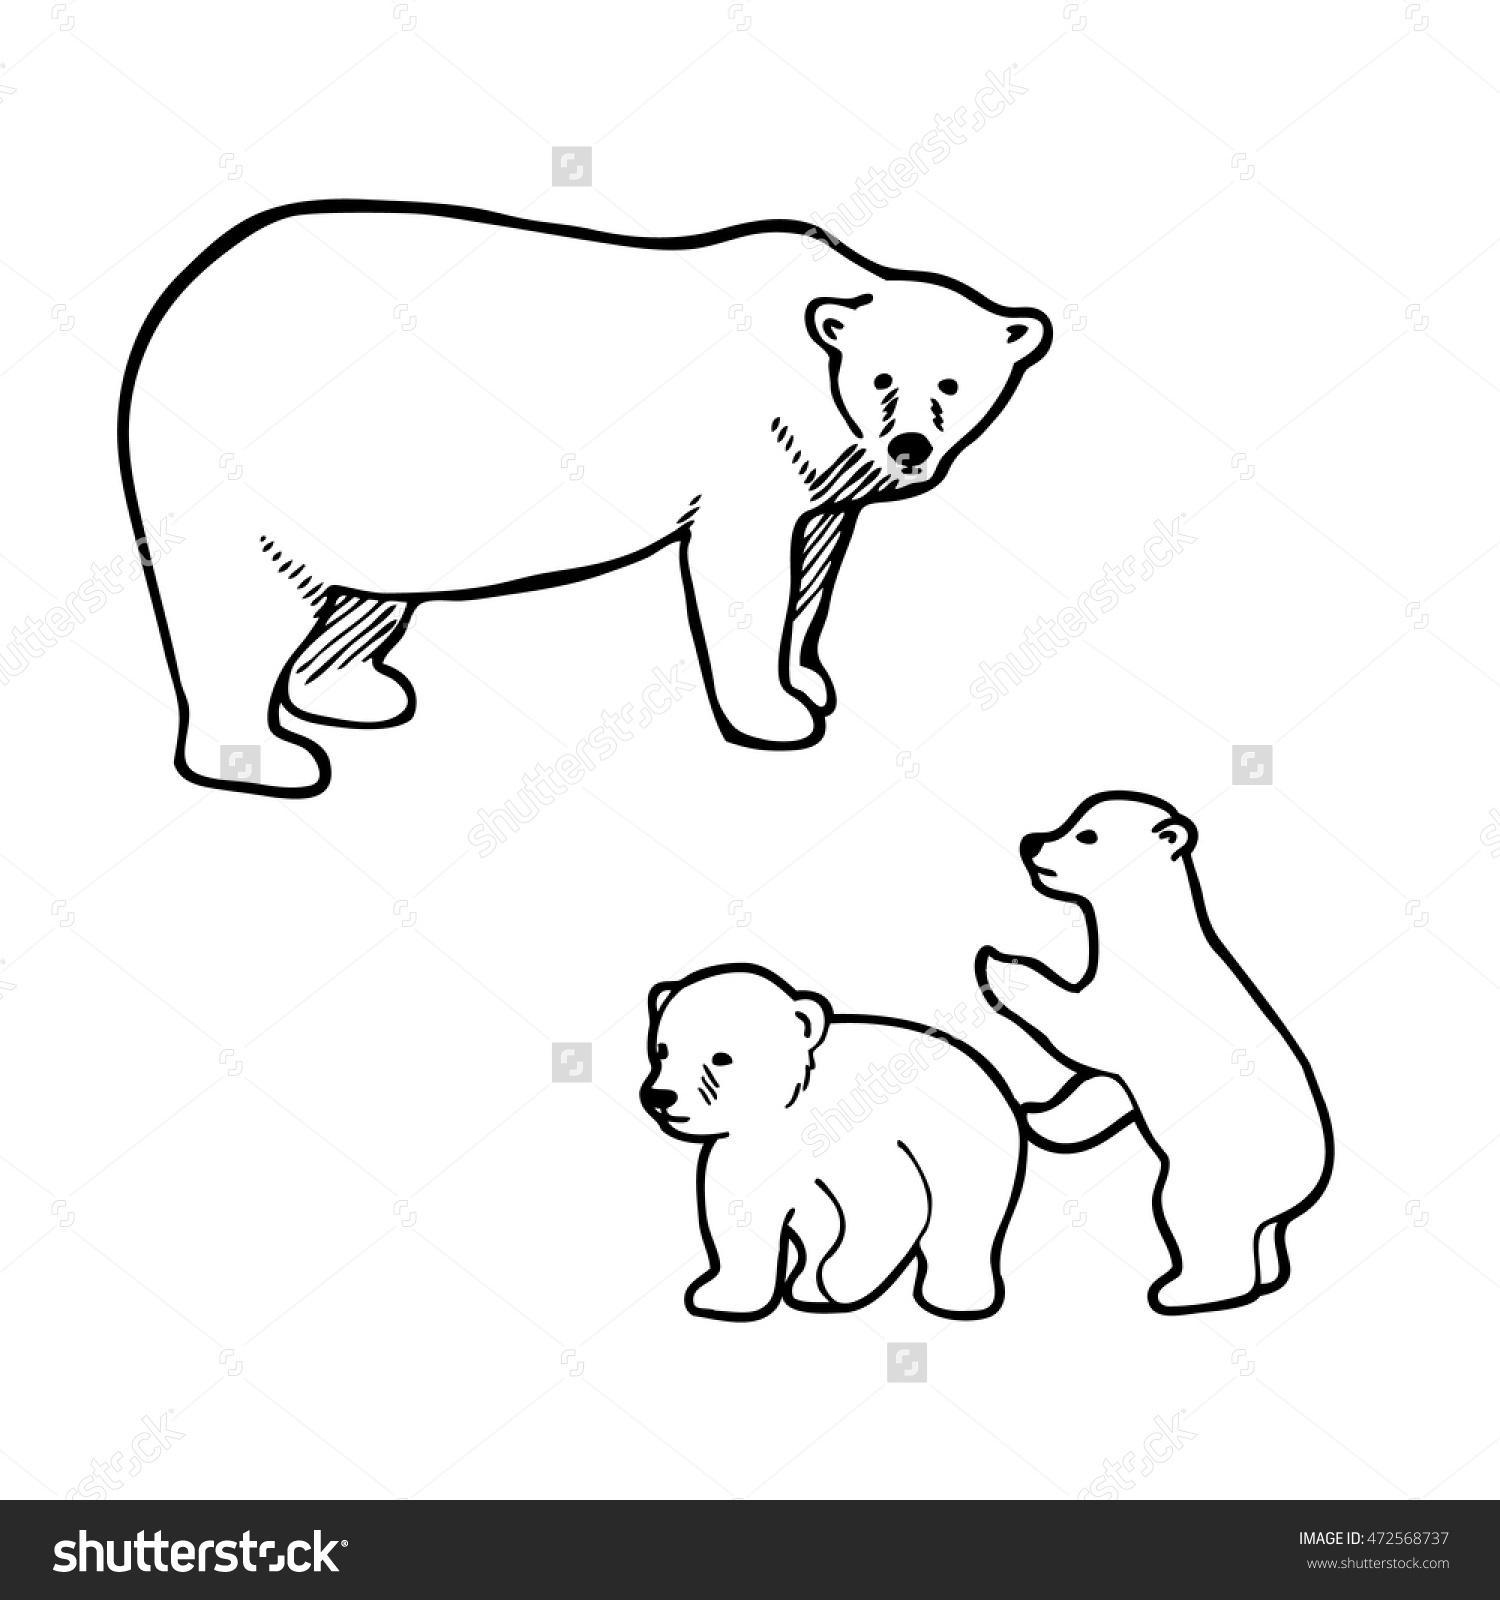 1500x1600 Outline Drawing Of A Polar Bear Polar Bear Playing Cubs Outline